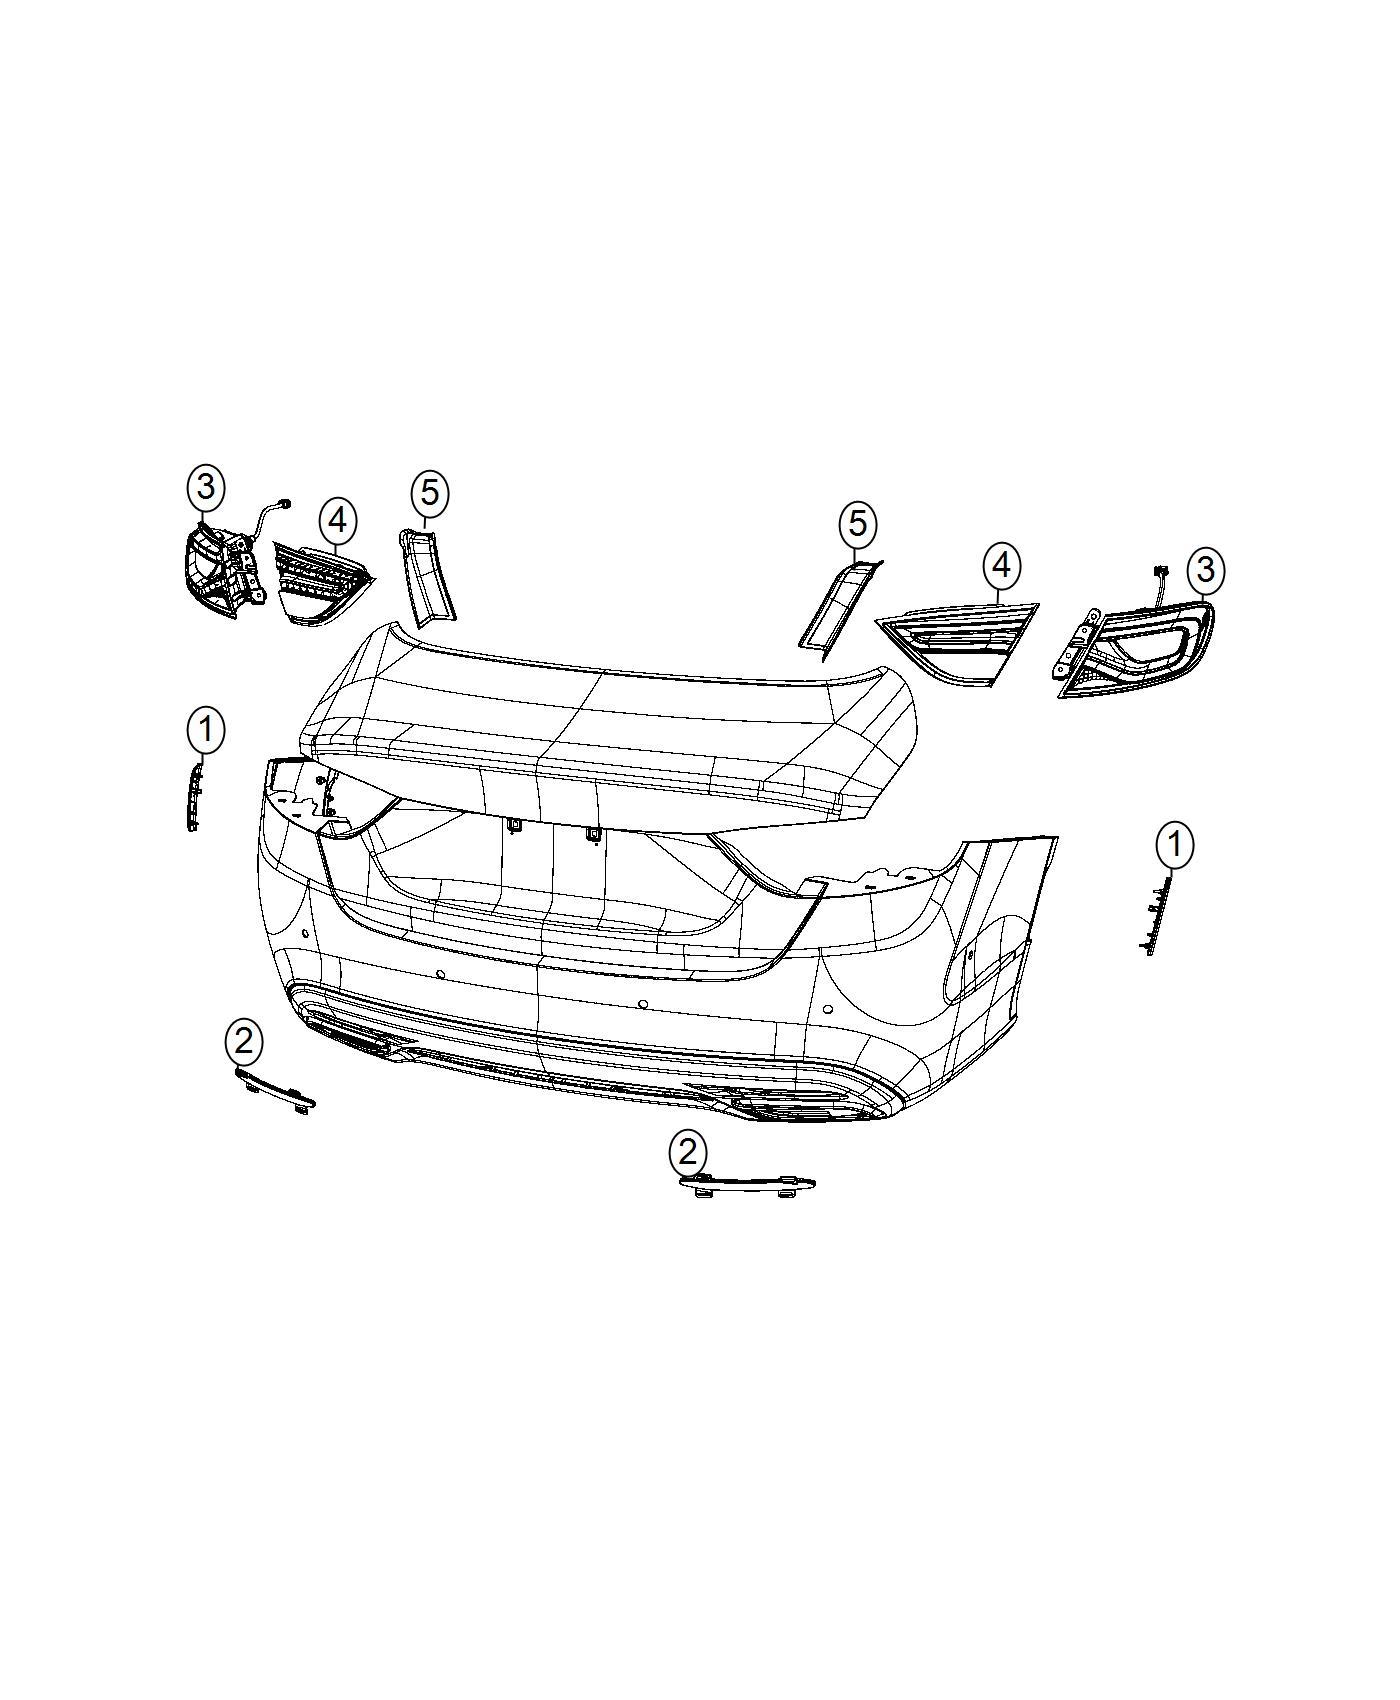 Chrysler 200 Bezel, reflector. Fascia. Right. [front